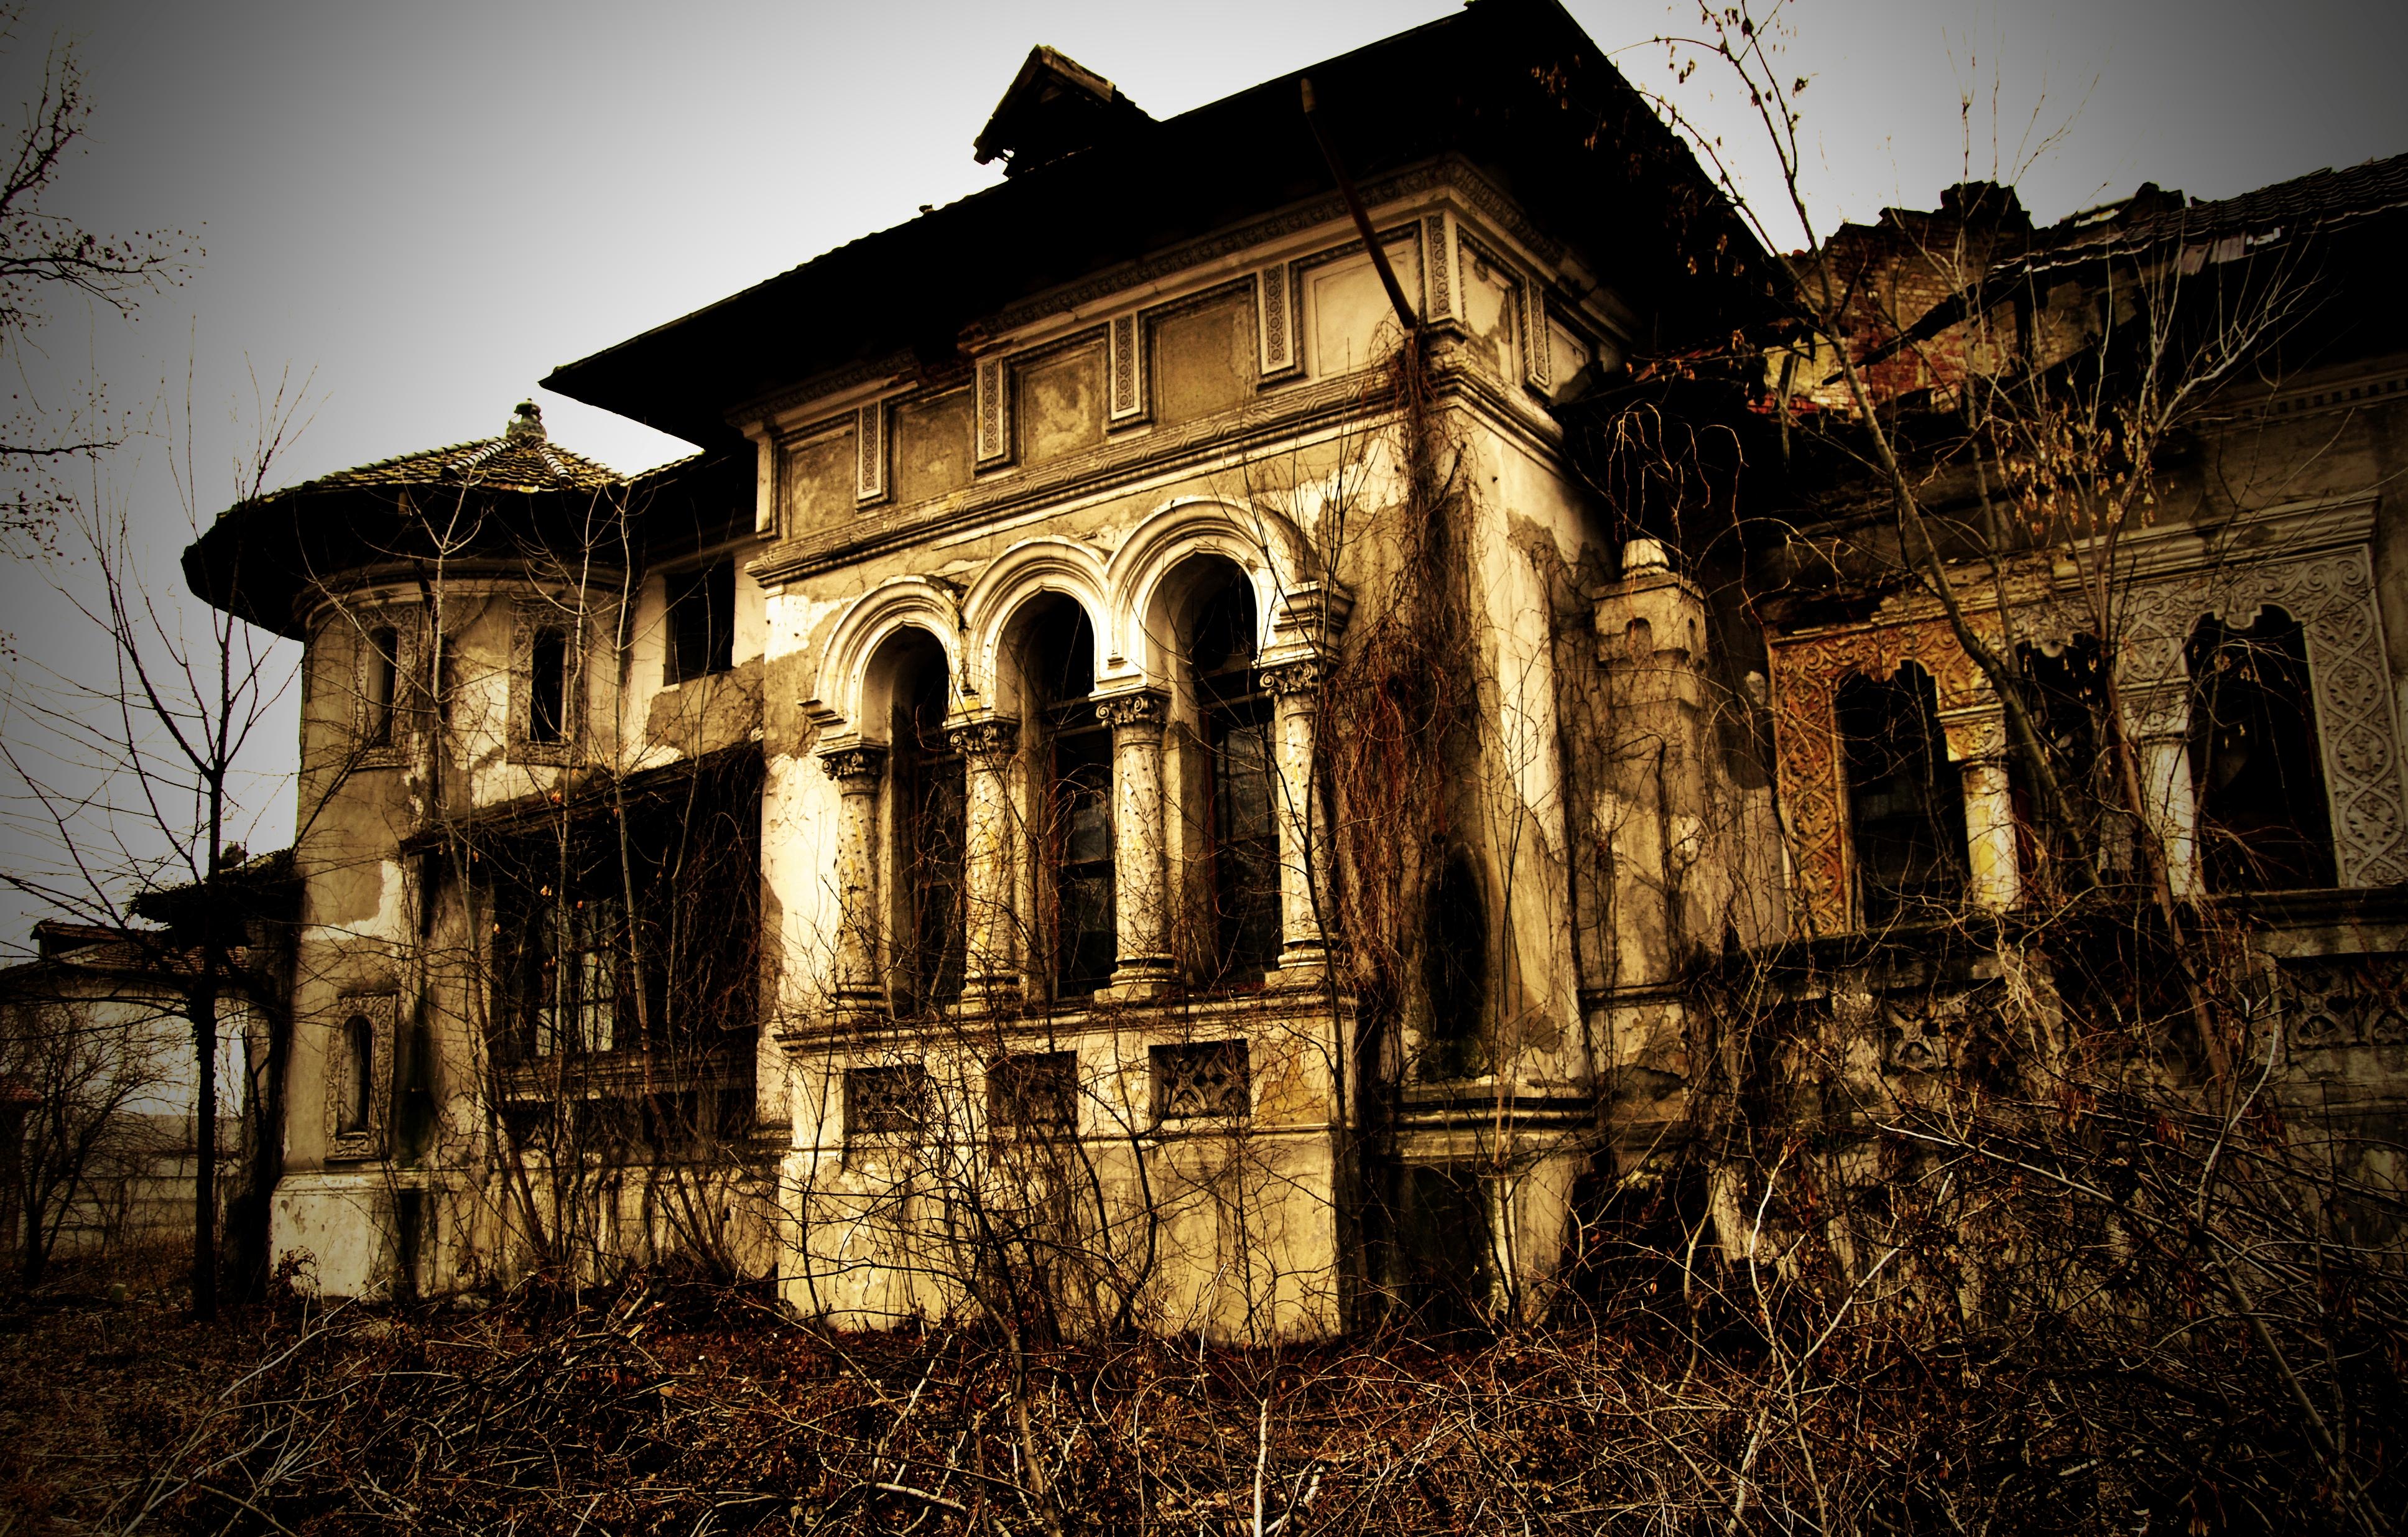 File:Casa Miclescu 1.jpg - Wikimedia Commons